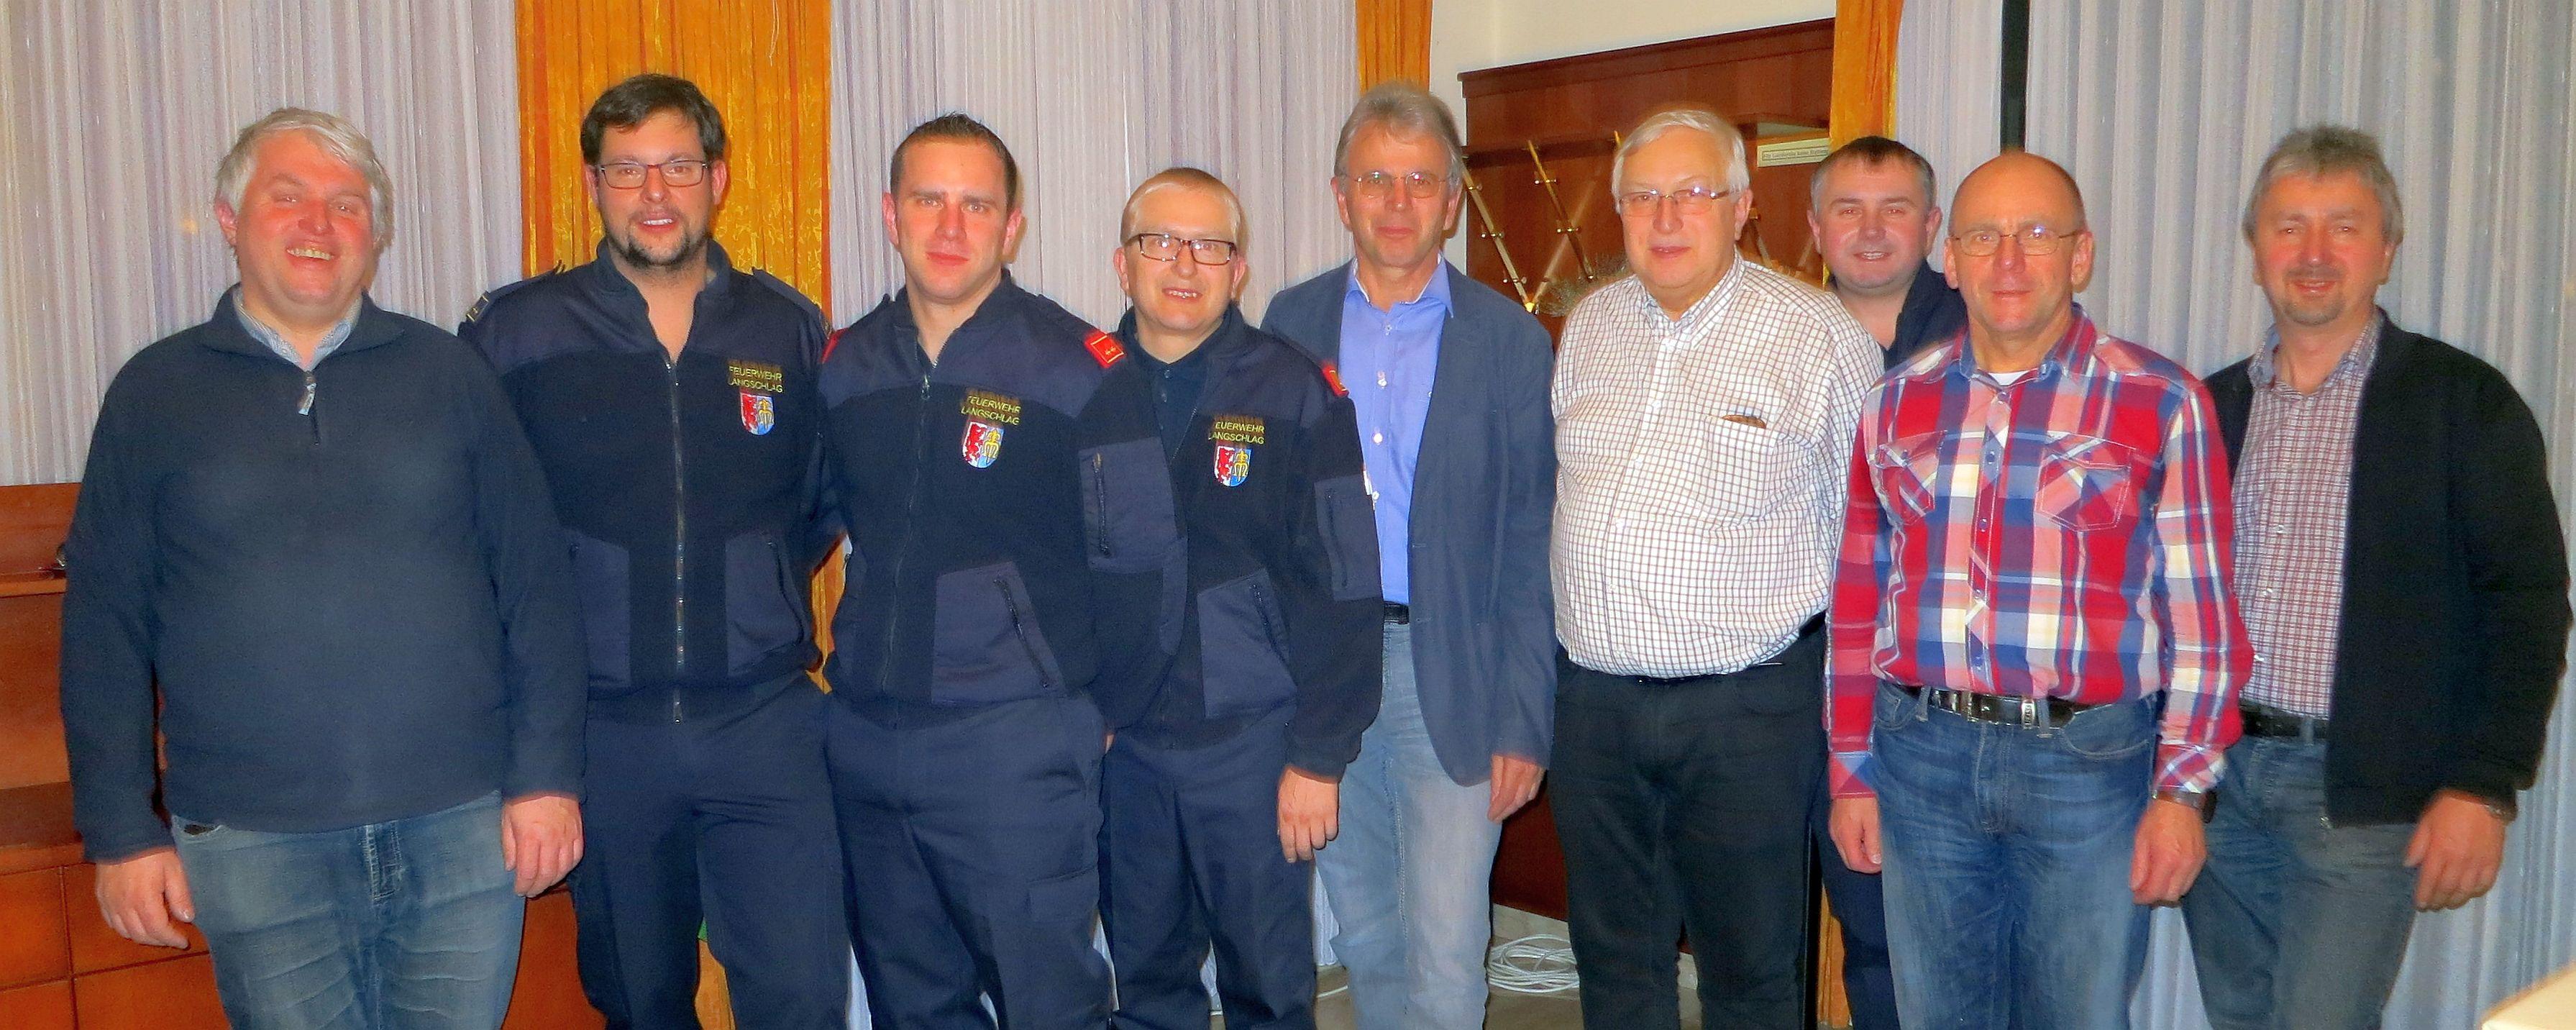 von links: FKur Mag. Bühringer Andreas, OV Leopoldseder Markus,  Kdt. StV OBI Eder Mario, Kdt. ABI Laister Sigmun,  Bgm Gottsbachner Herbert,